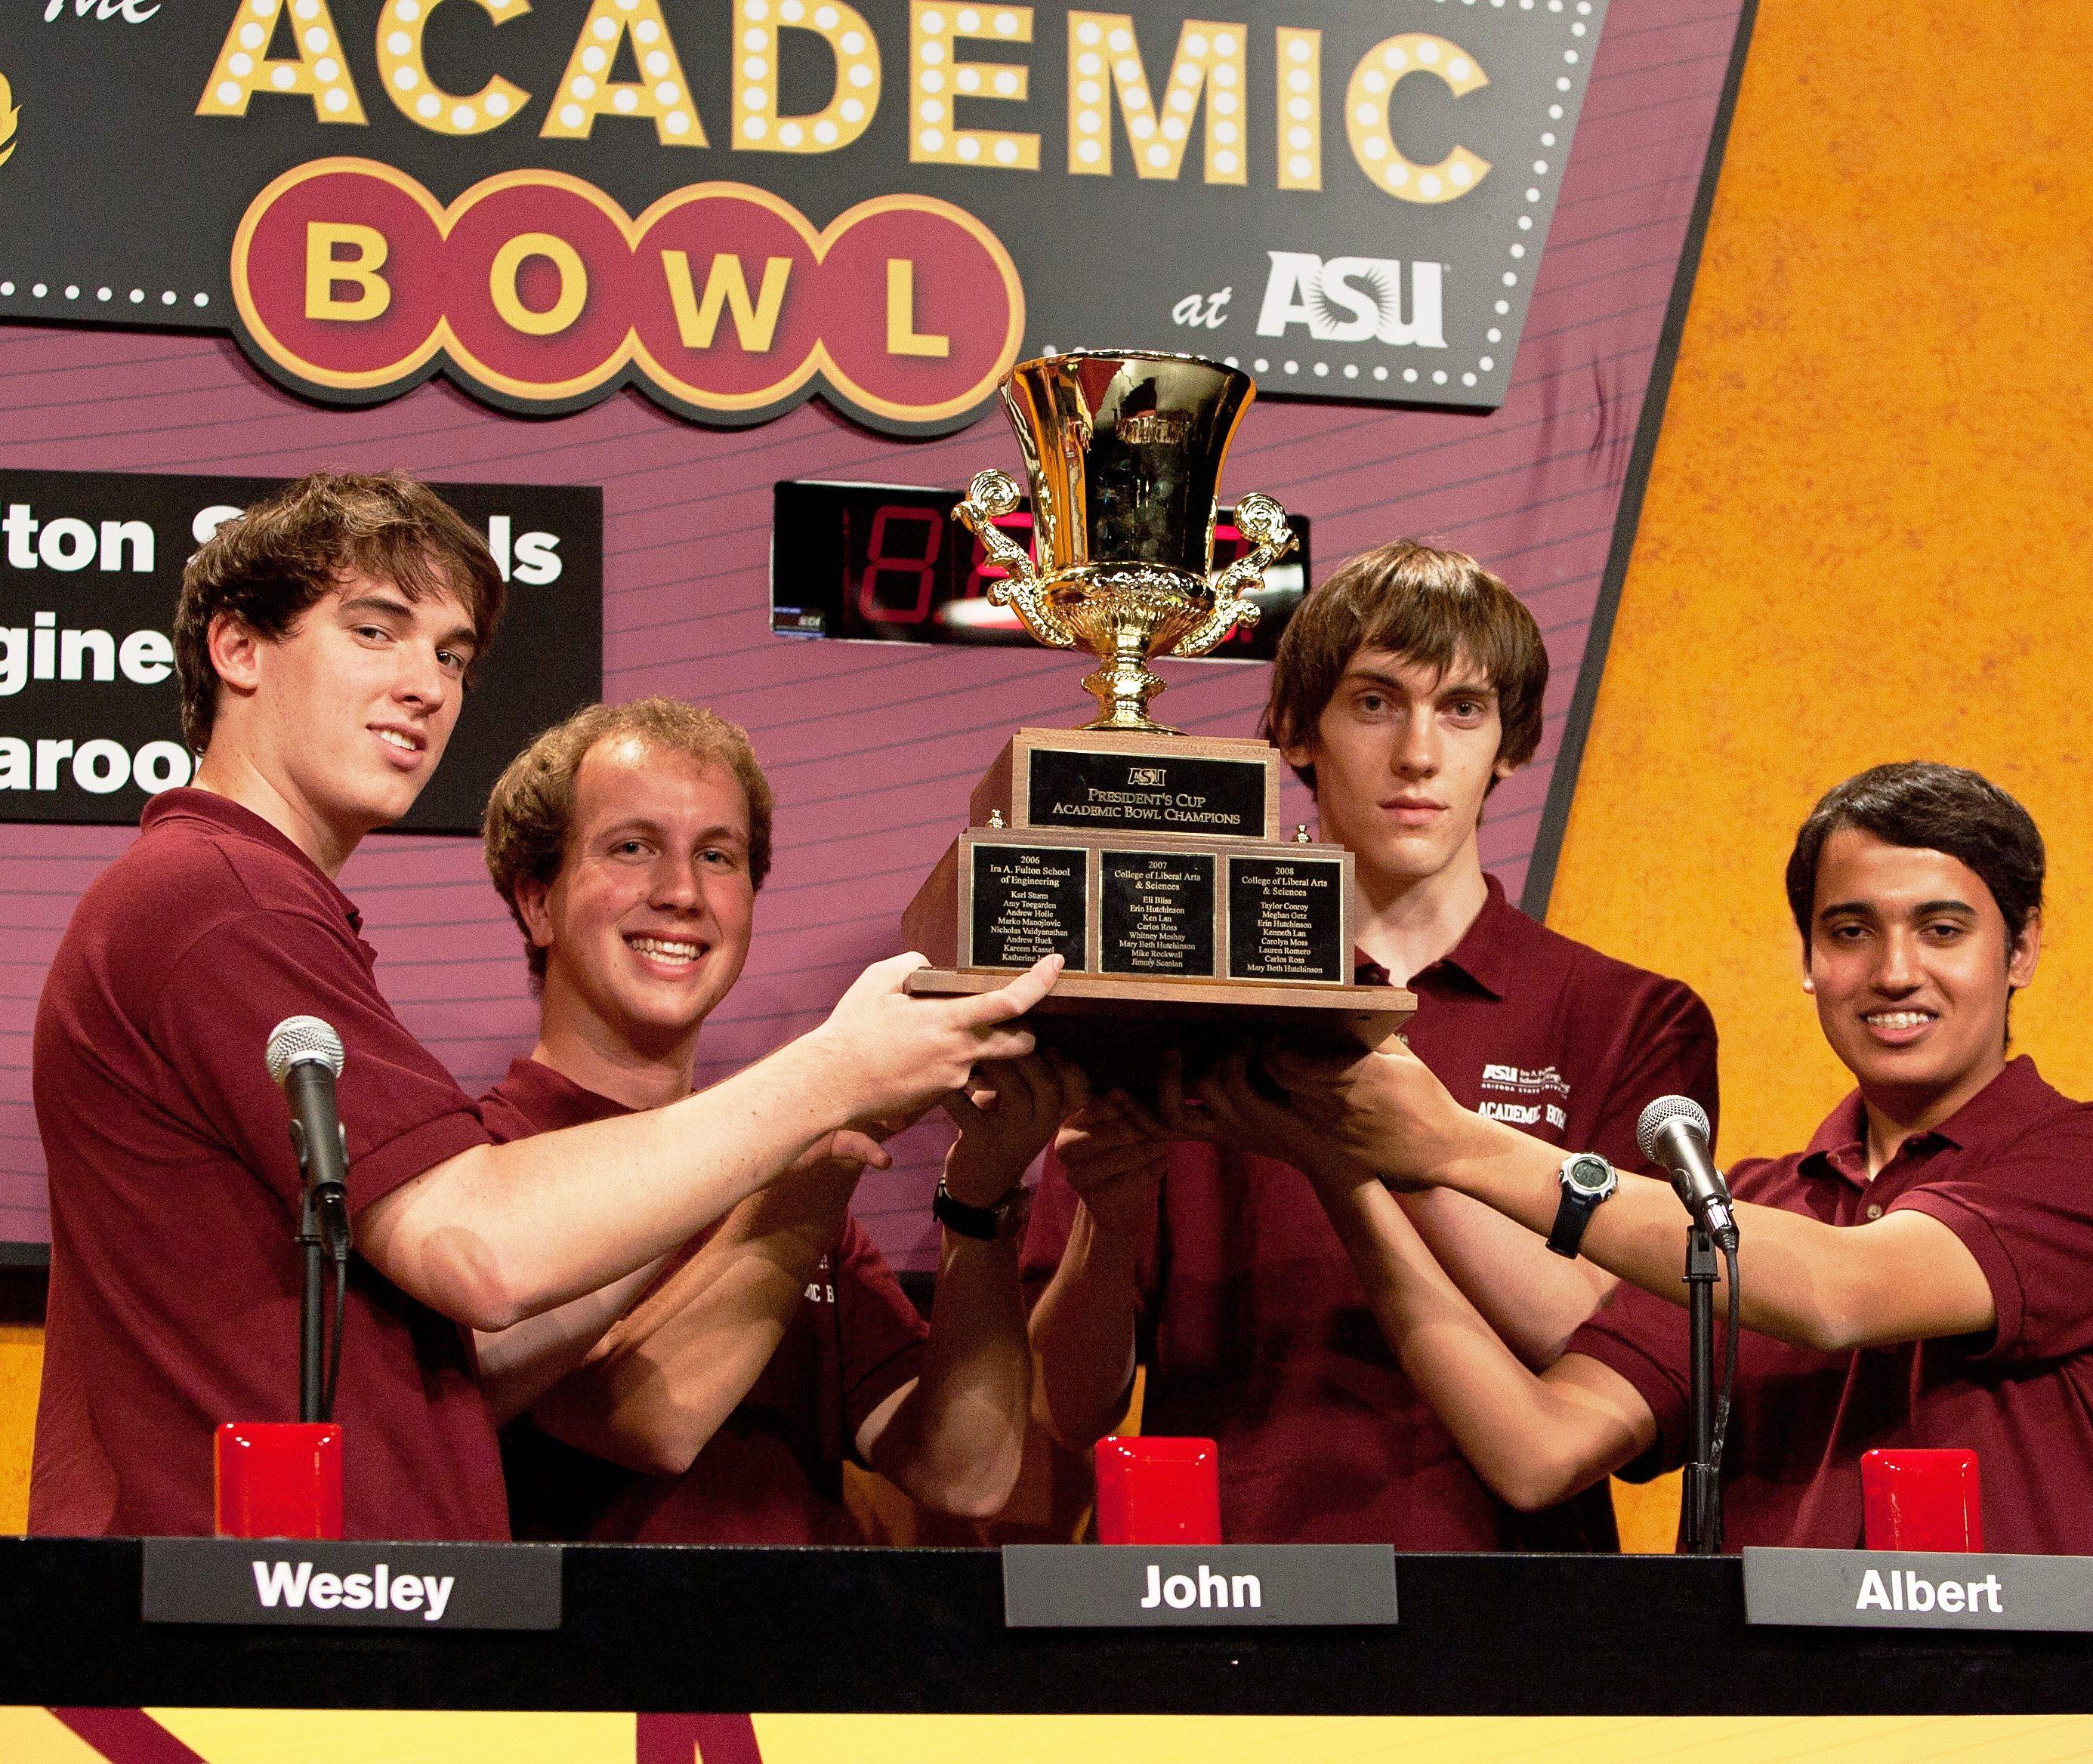 Ira A. Fulton Schools of Engineering team wins 2012 ASU Academic Bowl